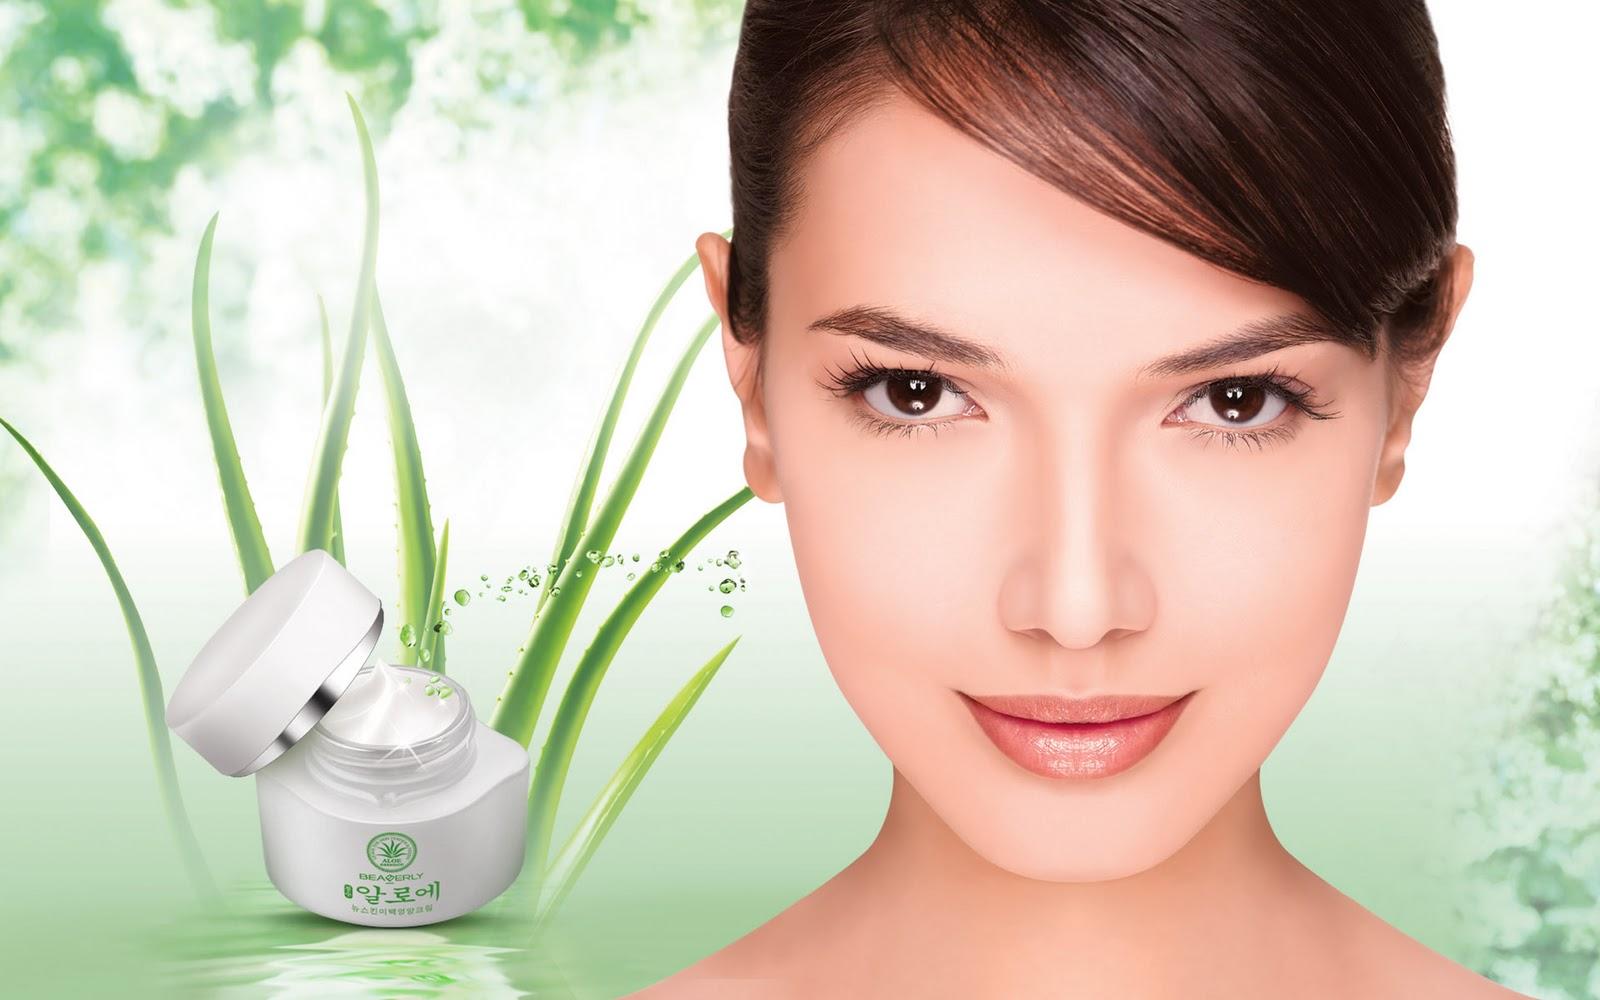 http://4.bp.blogspot.com/_g31KVvREHW4/TP9Y5djCycI/AAAAAAAABXc/LqPXf-zS5ko/s1600/cosmetics+advertising%252Cjpg+%252811%2529.jpg